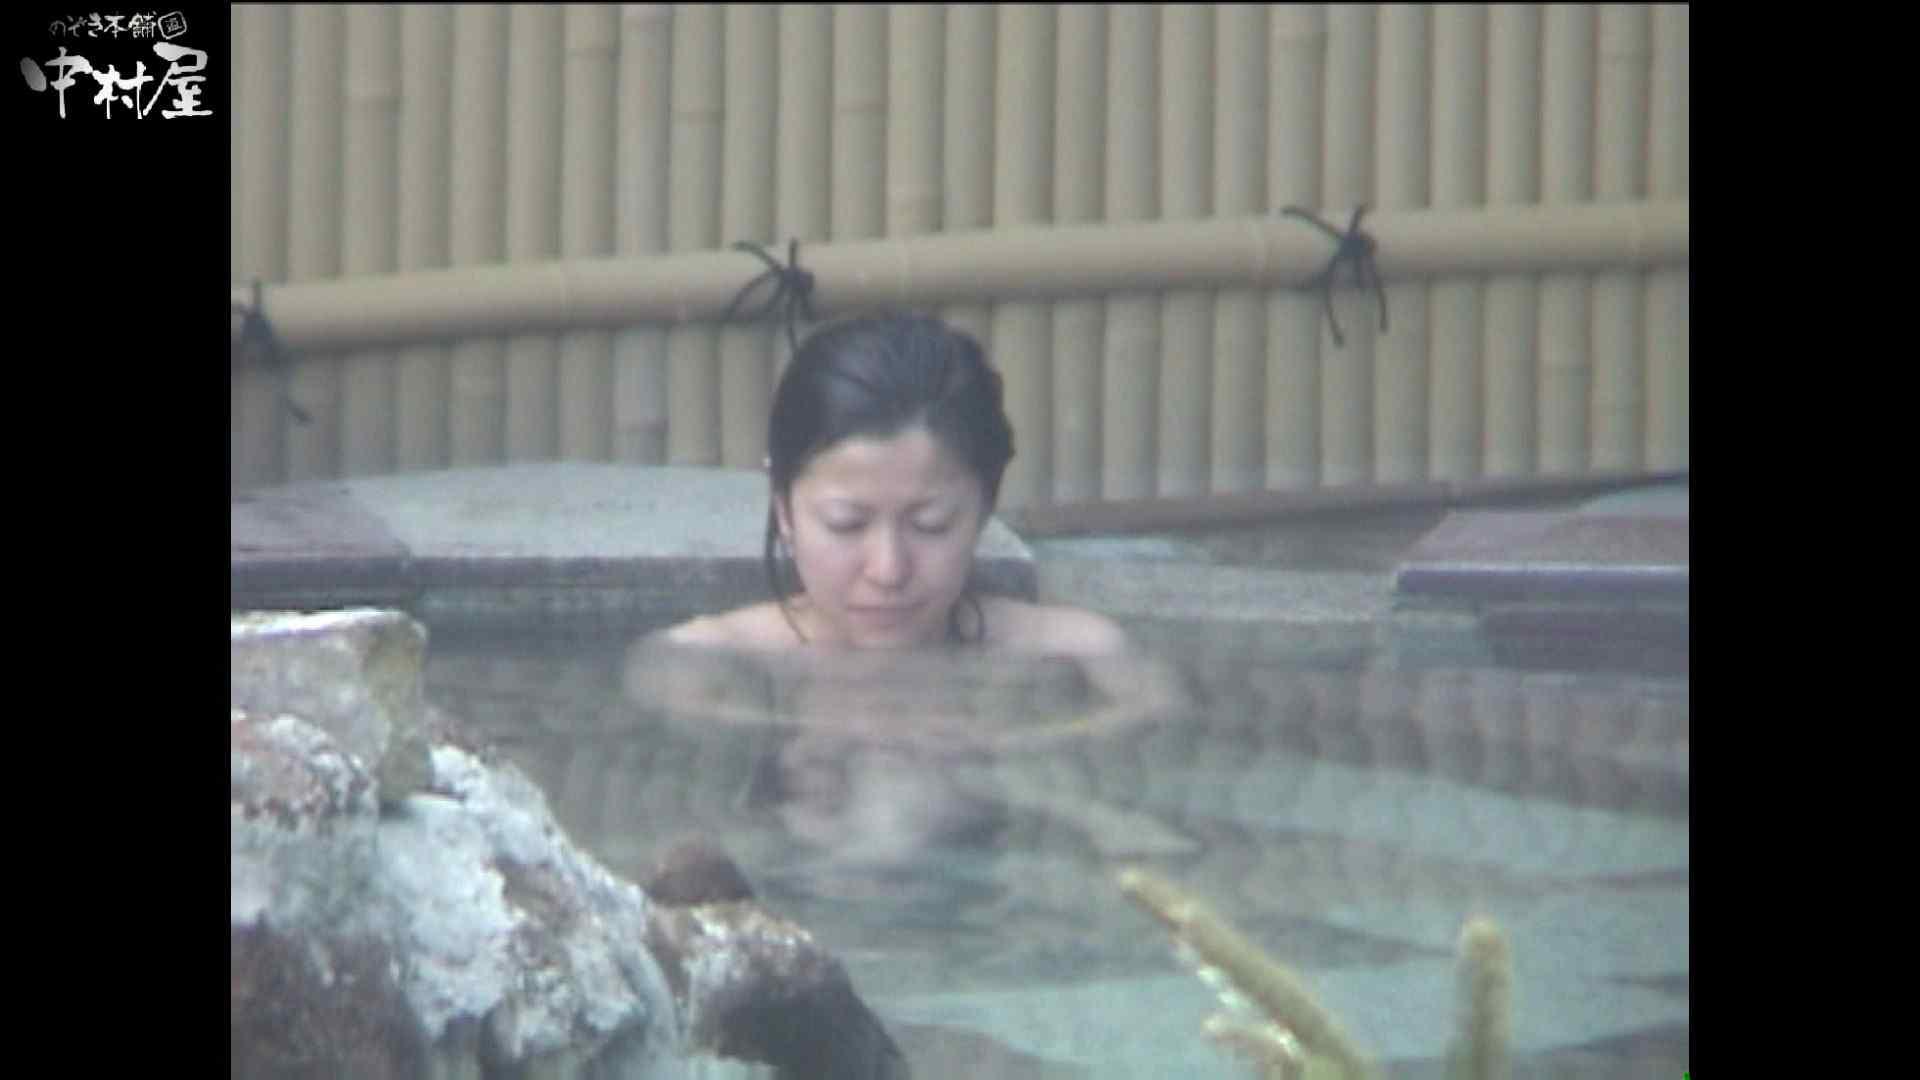 Aquaな露天風呂Vol.986 盗撮  94連発 79